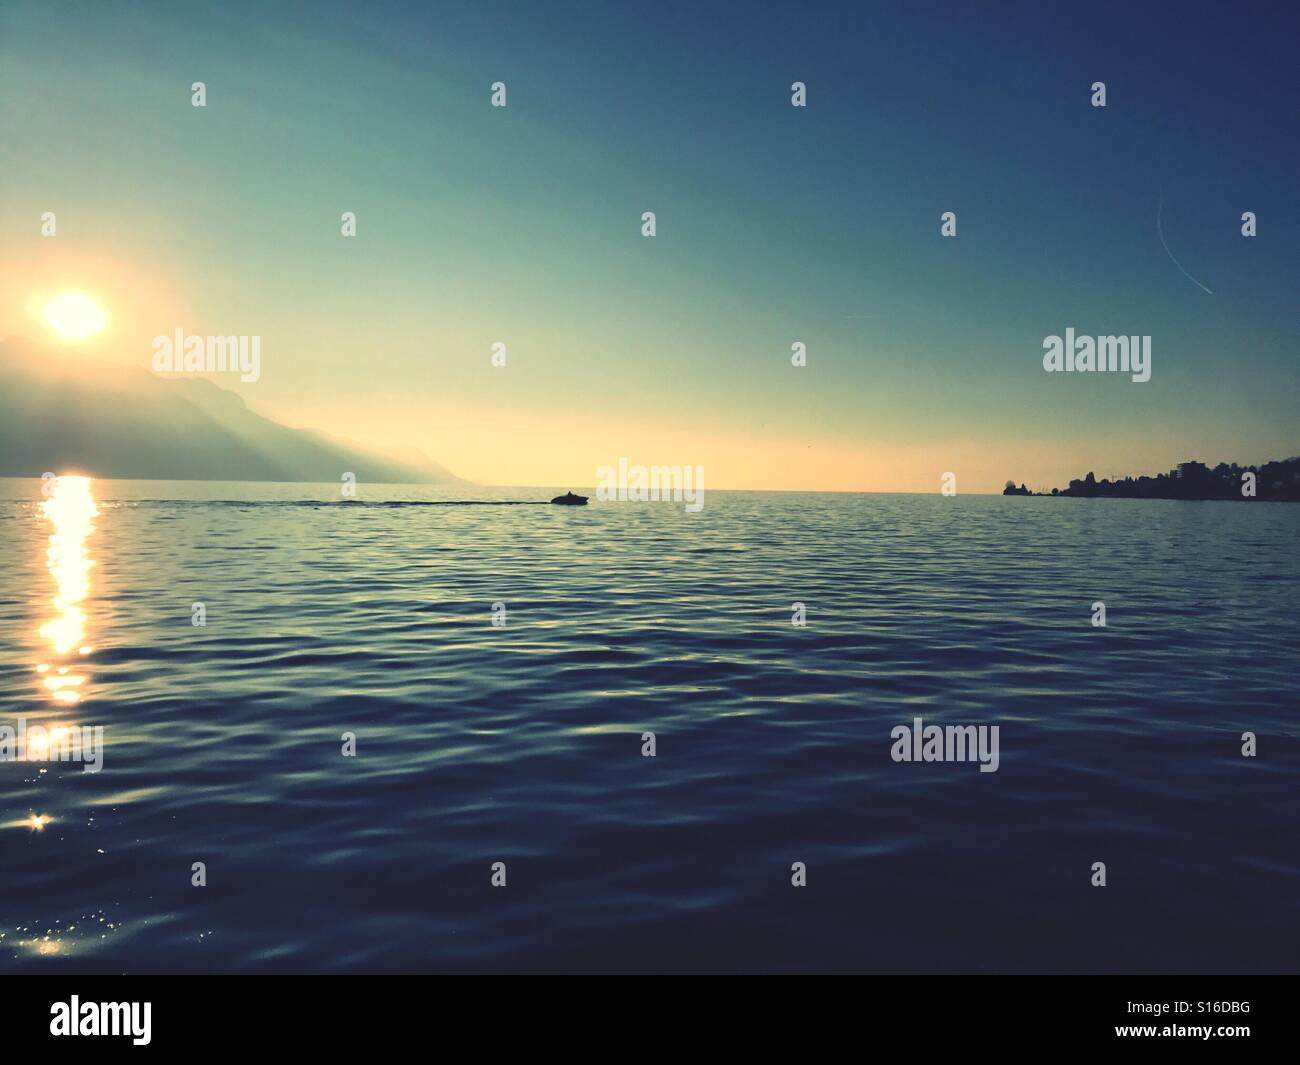 Lake Leman Montreux Switzerland - Stock Image